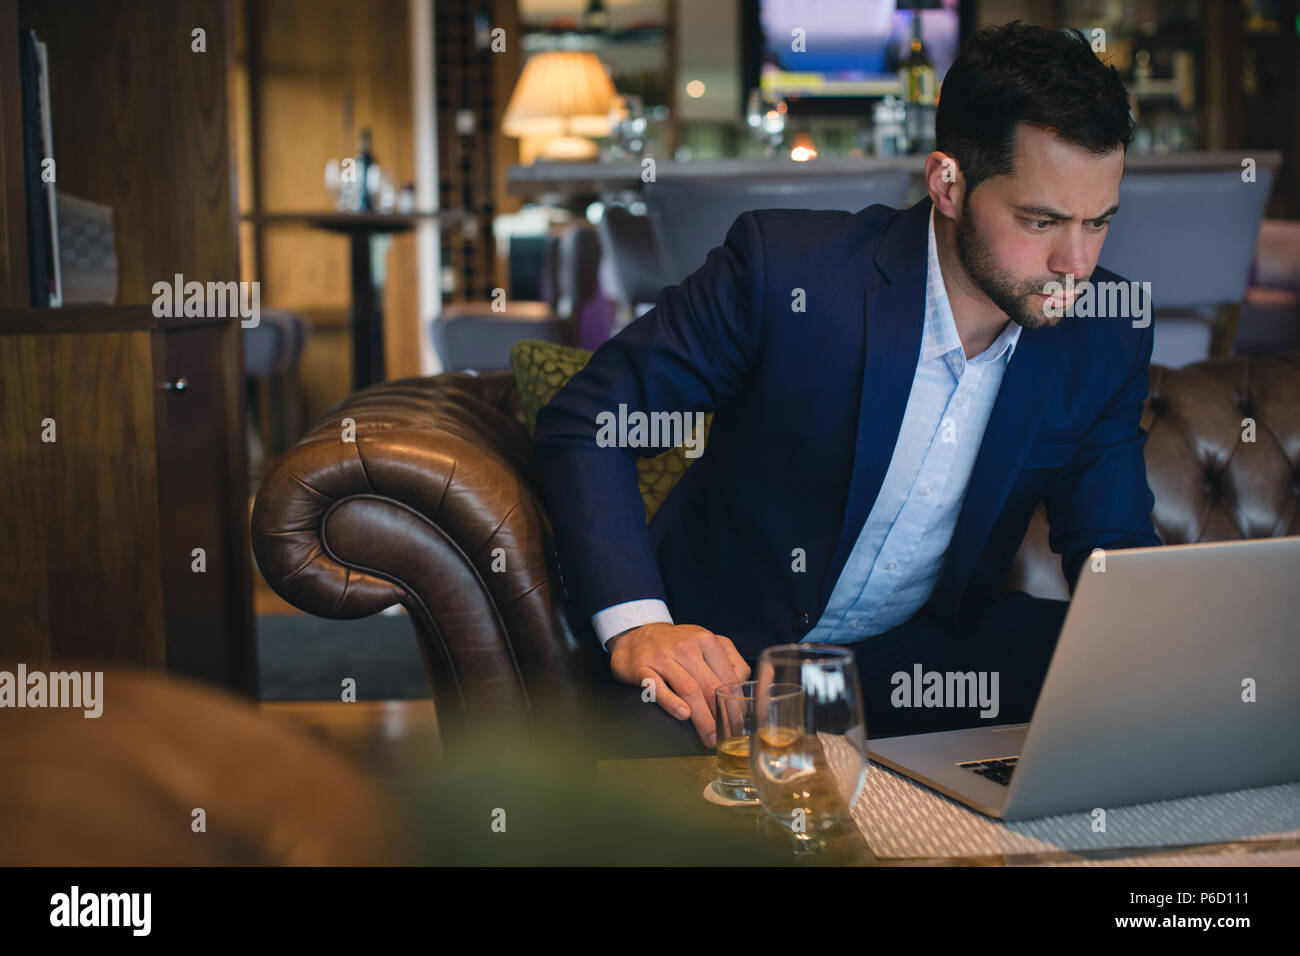 Businessman using laptop Photo Stock